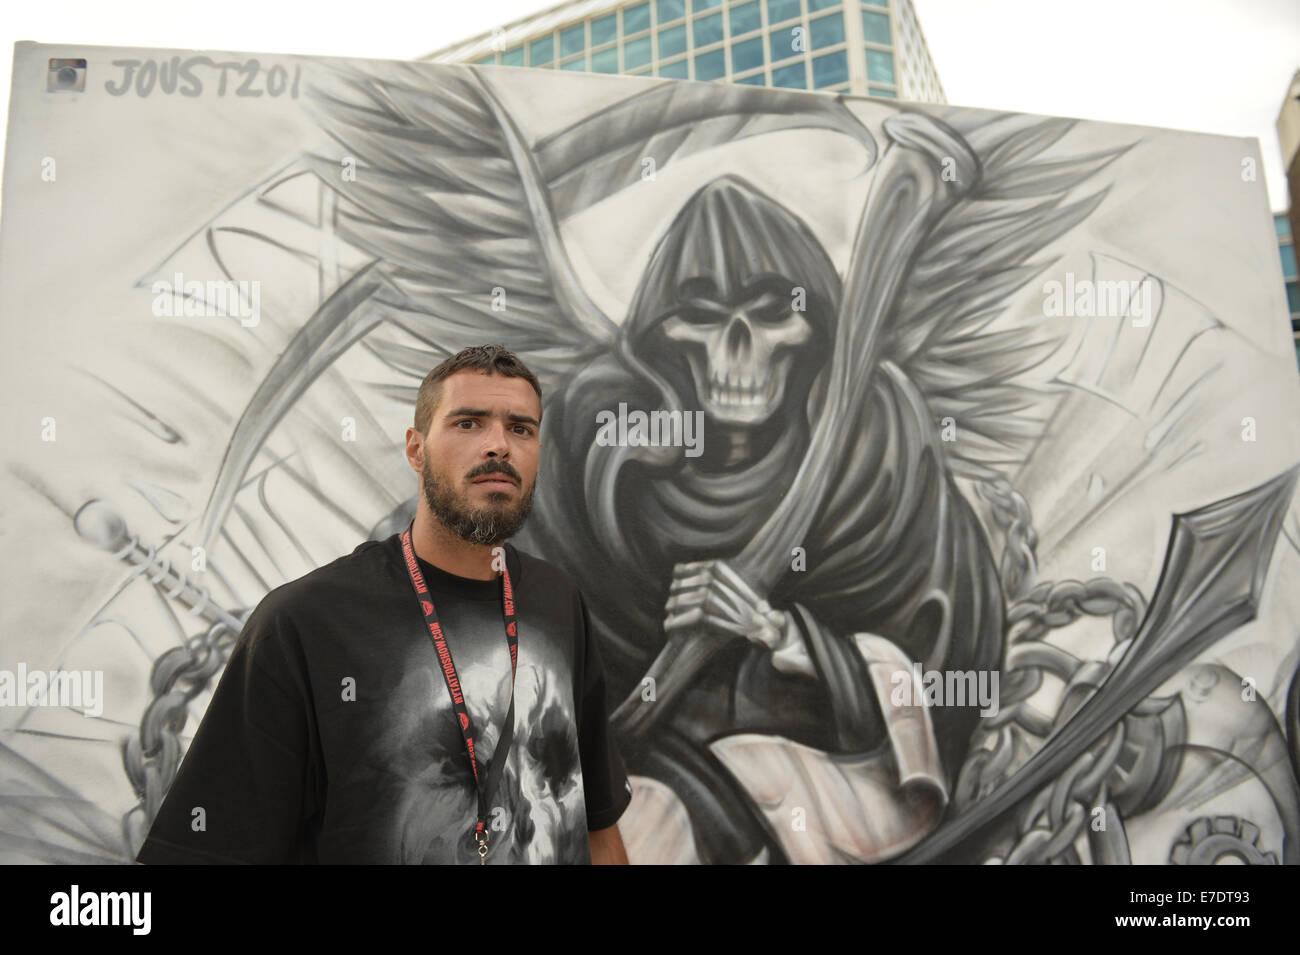 Garden City, New York, USA. 14th Sep, 2014. DAN AZACETA, aka JOUST201, from New Jersey, is a graffiti artist creating - Stock Image